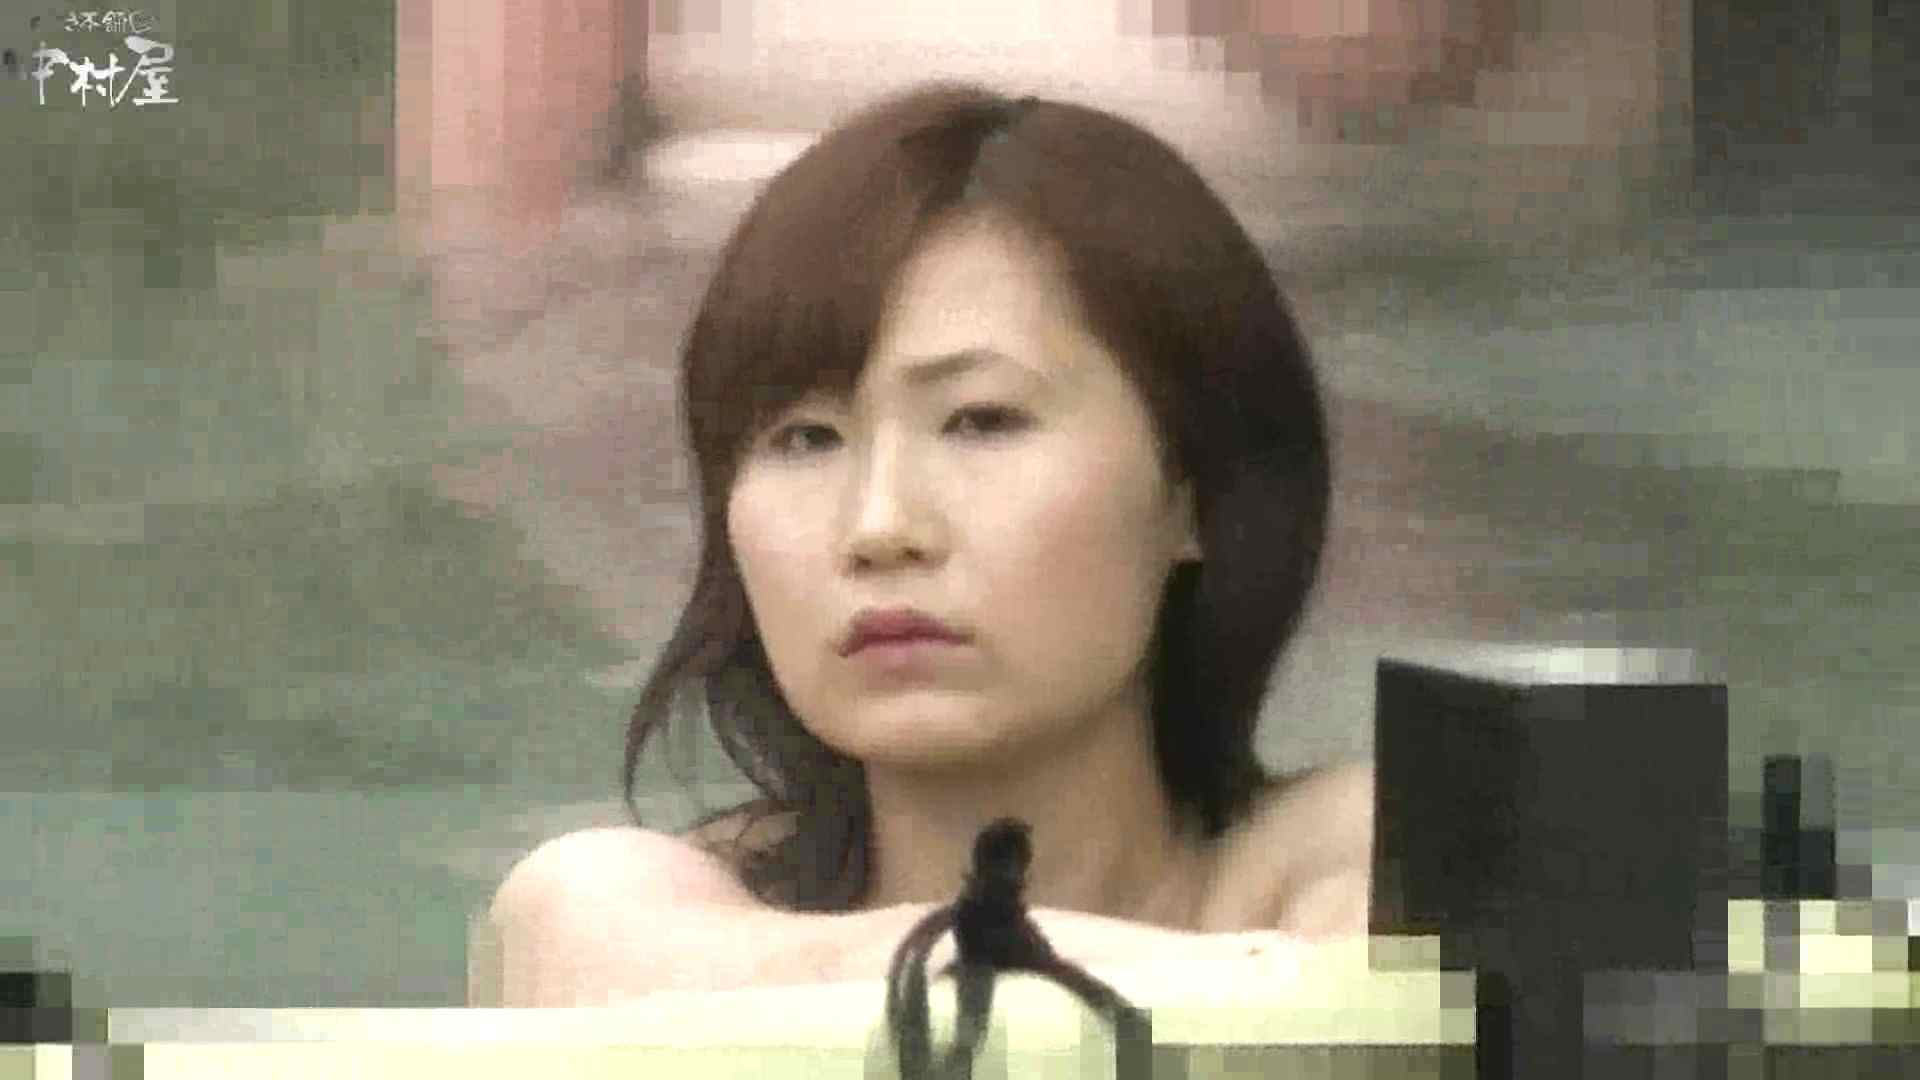 Aquaな露天風呂Vol.877潜入盗撮露天風呂十三判湯 其の二 潜入  100PIX 48